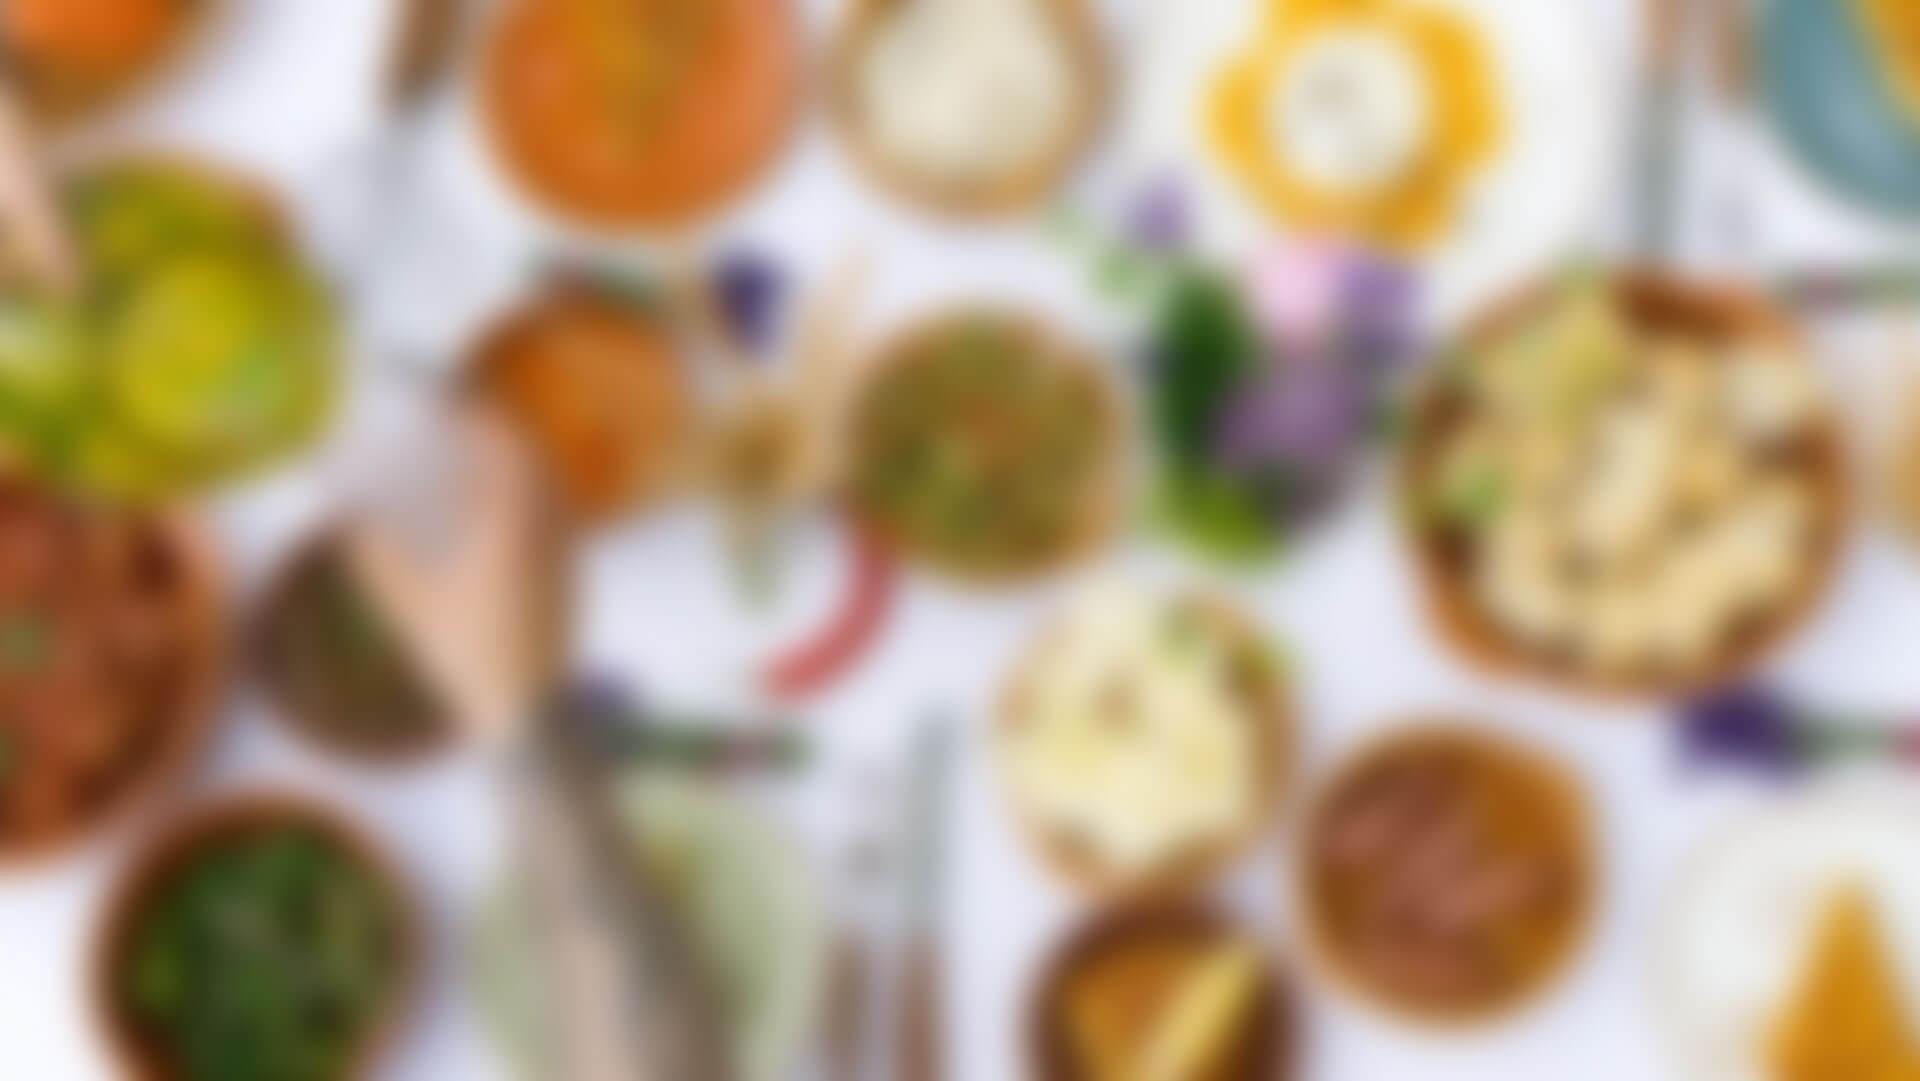 Gernekochen - Leckere Rezepte | Kochen | Grillen | Backen | Thermomix